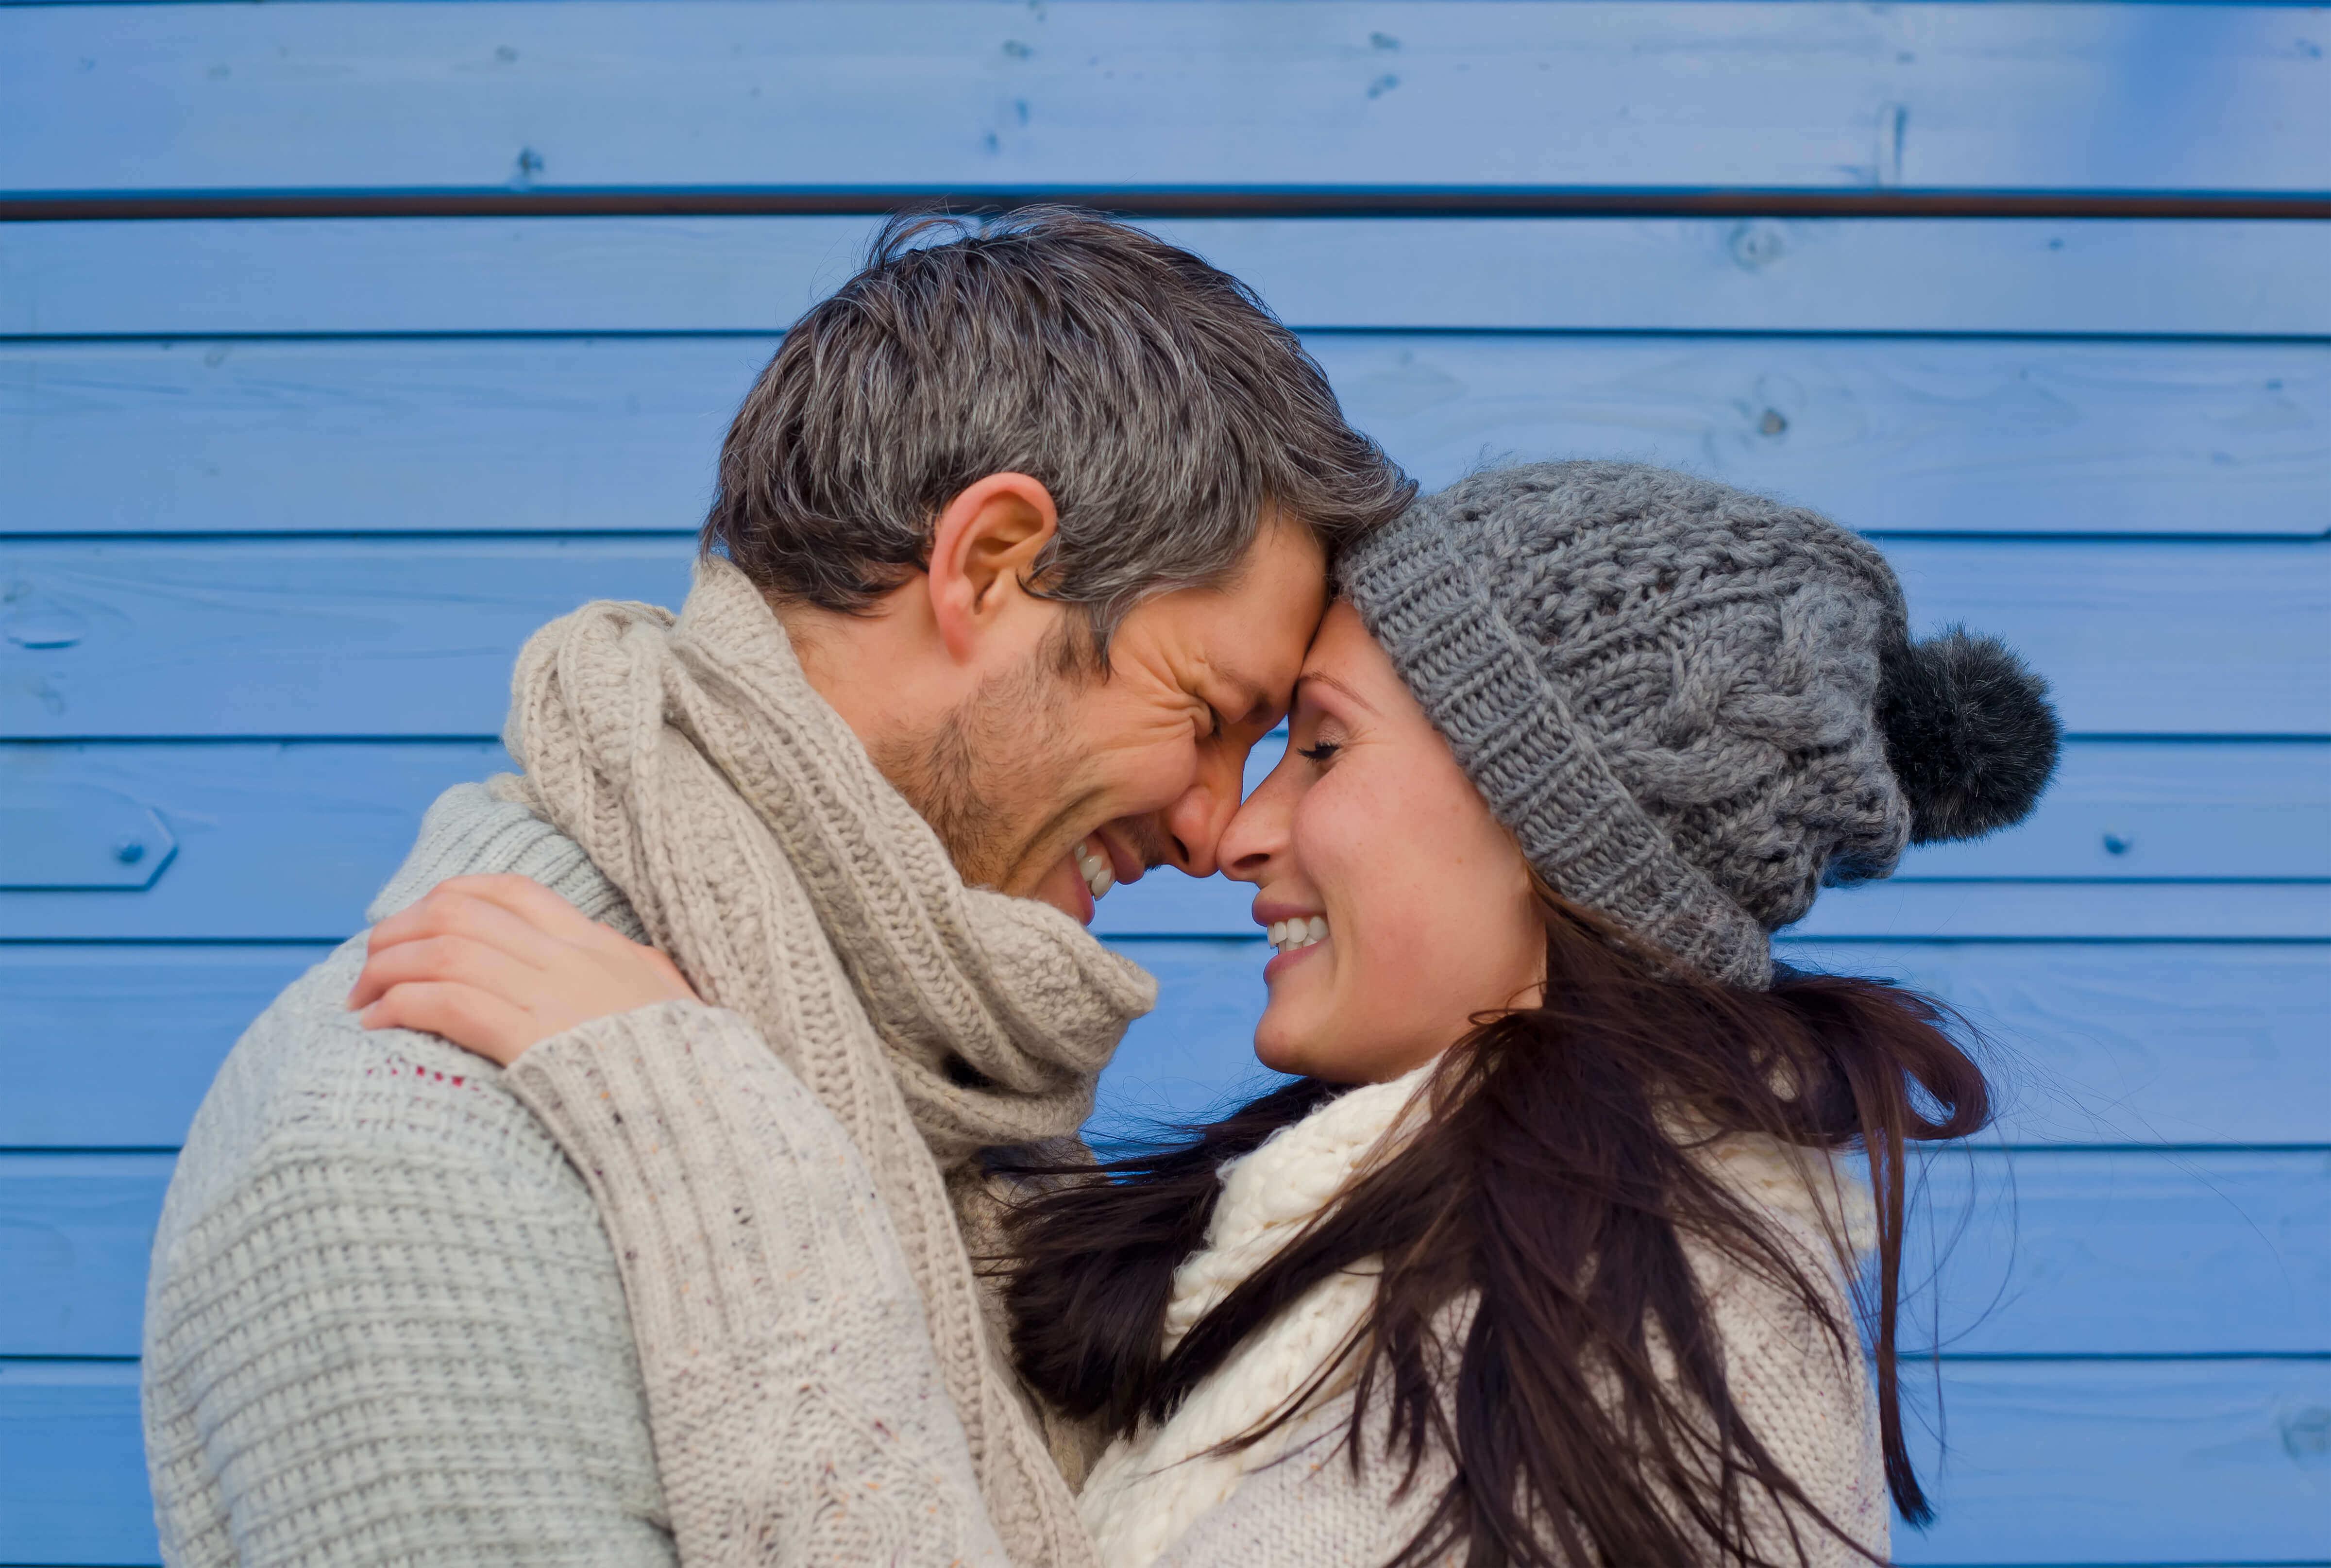 Couple in Soul Love